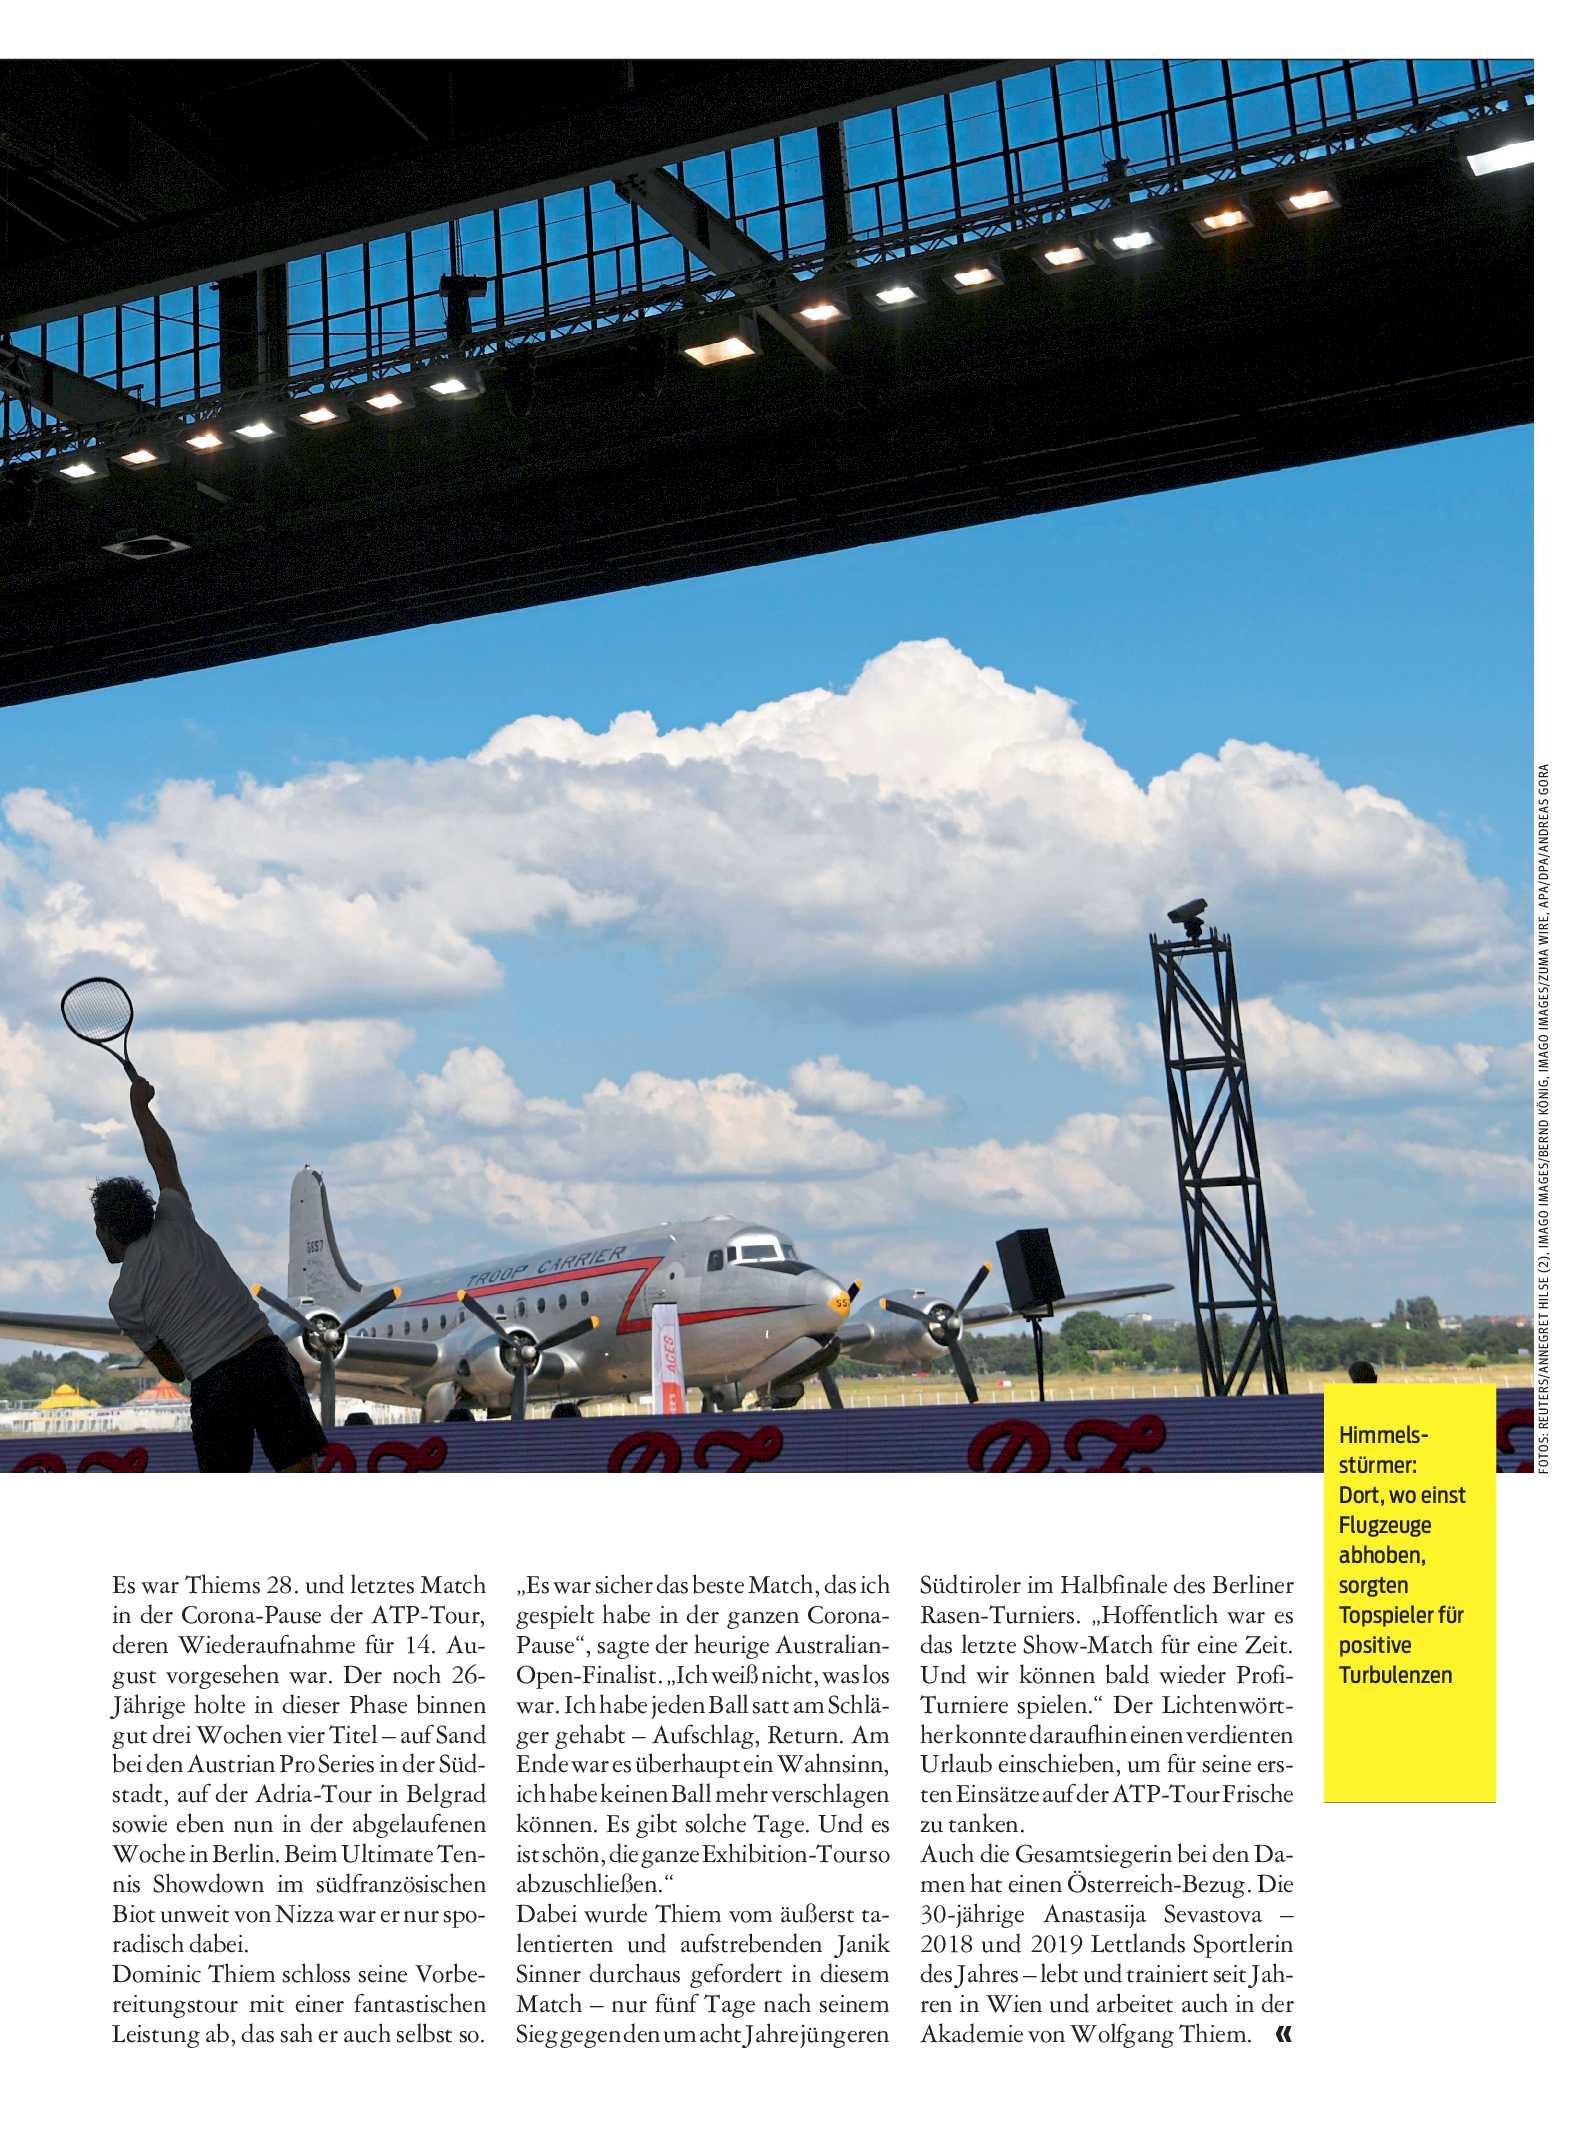 public/epaper/imported/20201209/kurier/magazin/magazin_20201209_117.jpg